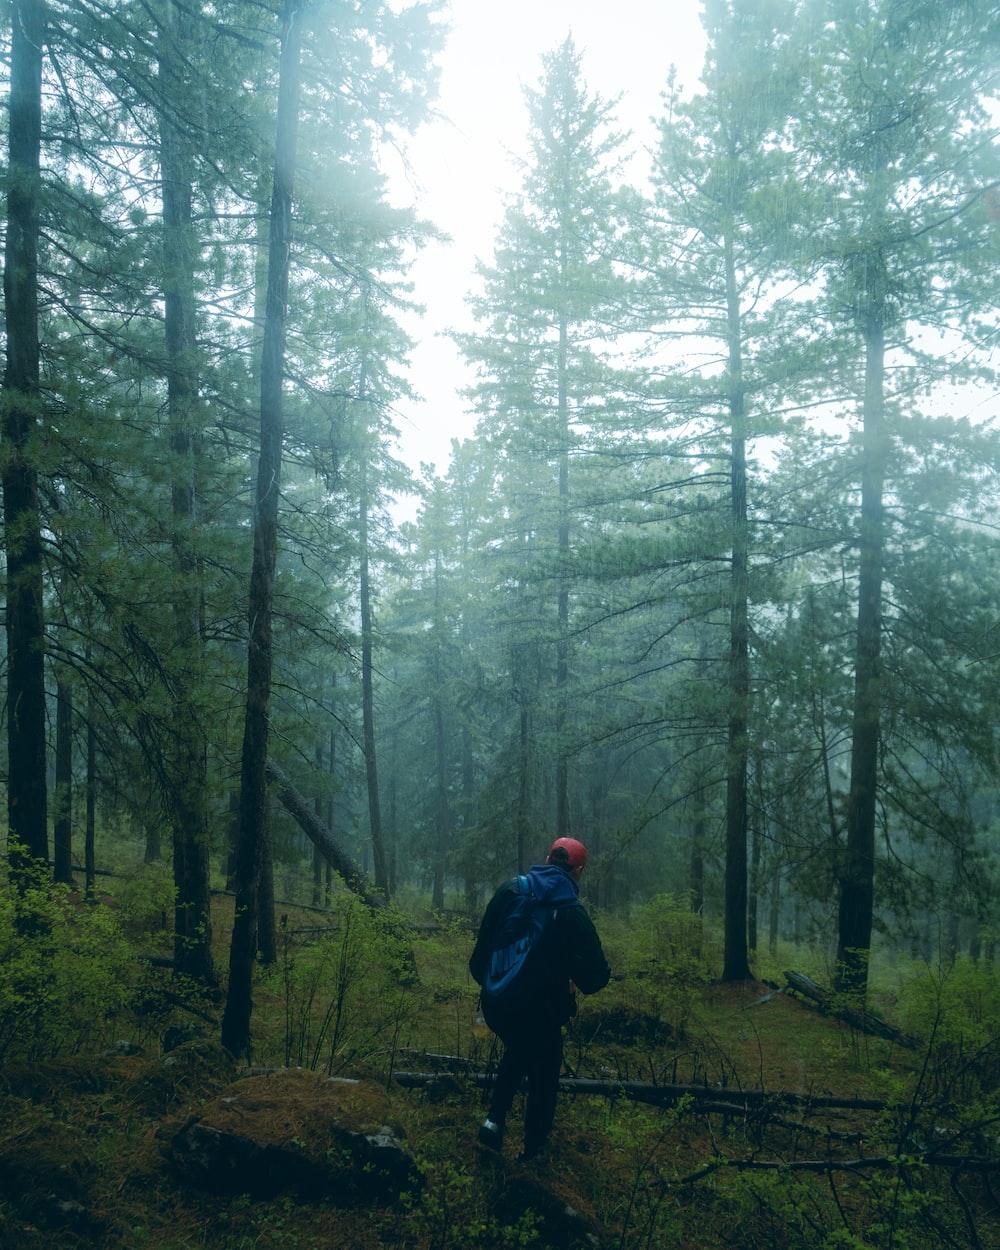 man in black jacket walking on forest during daytime